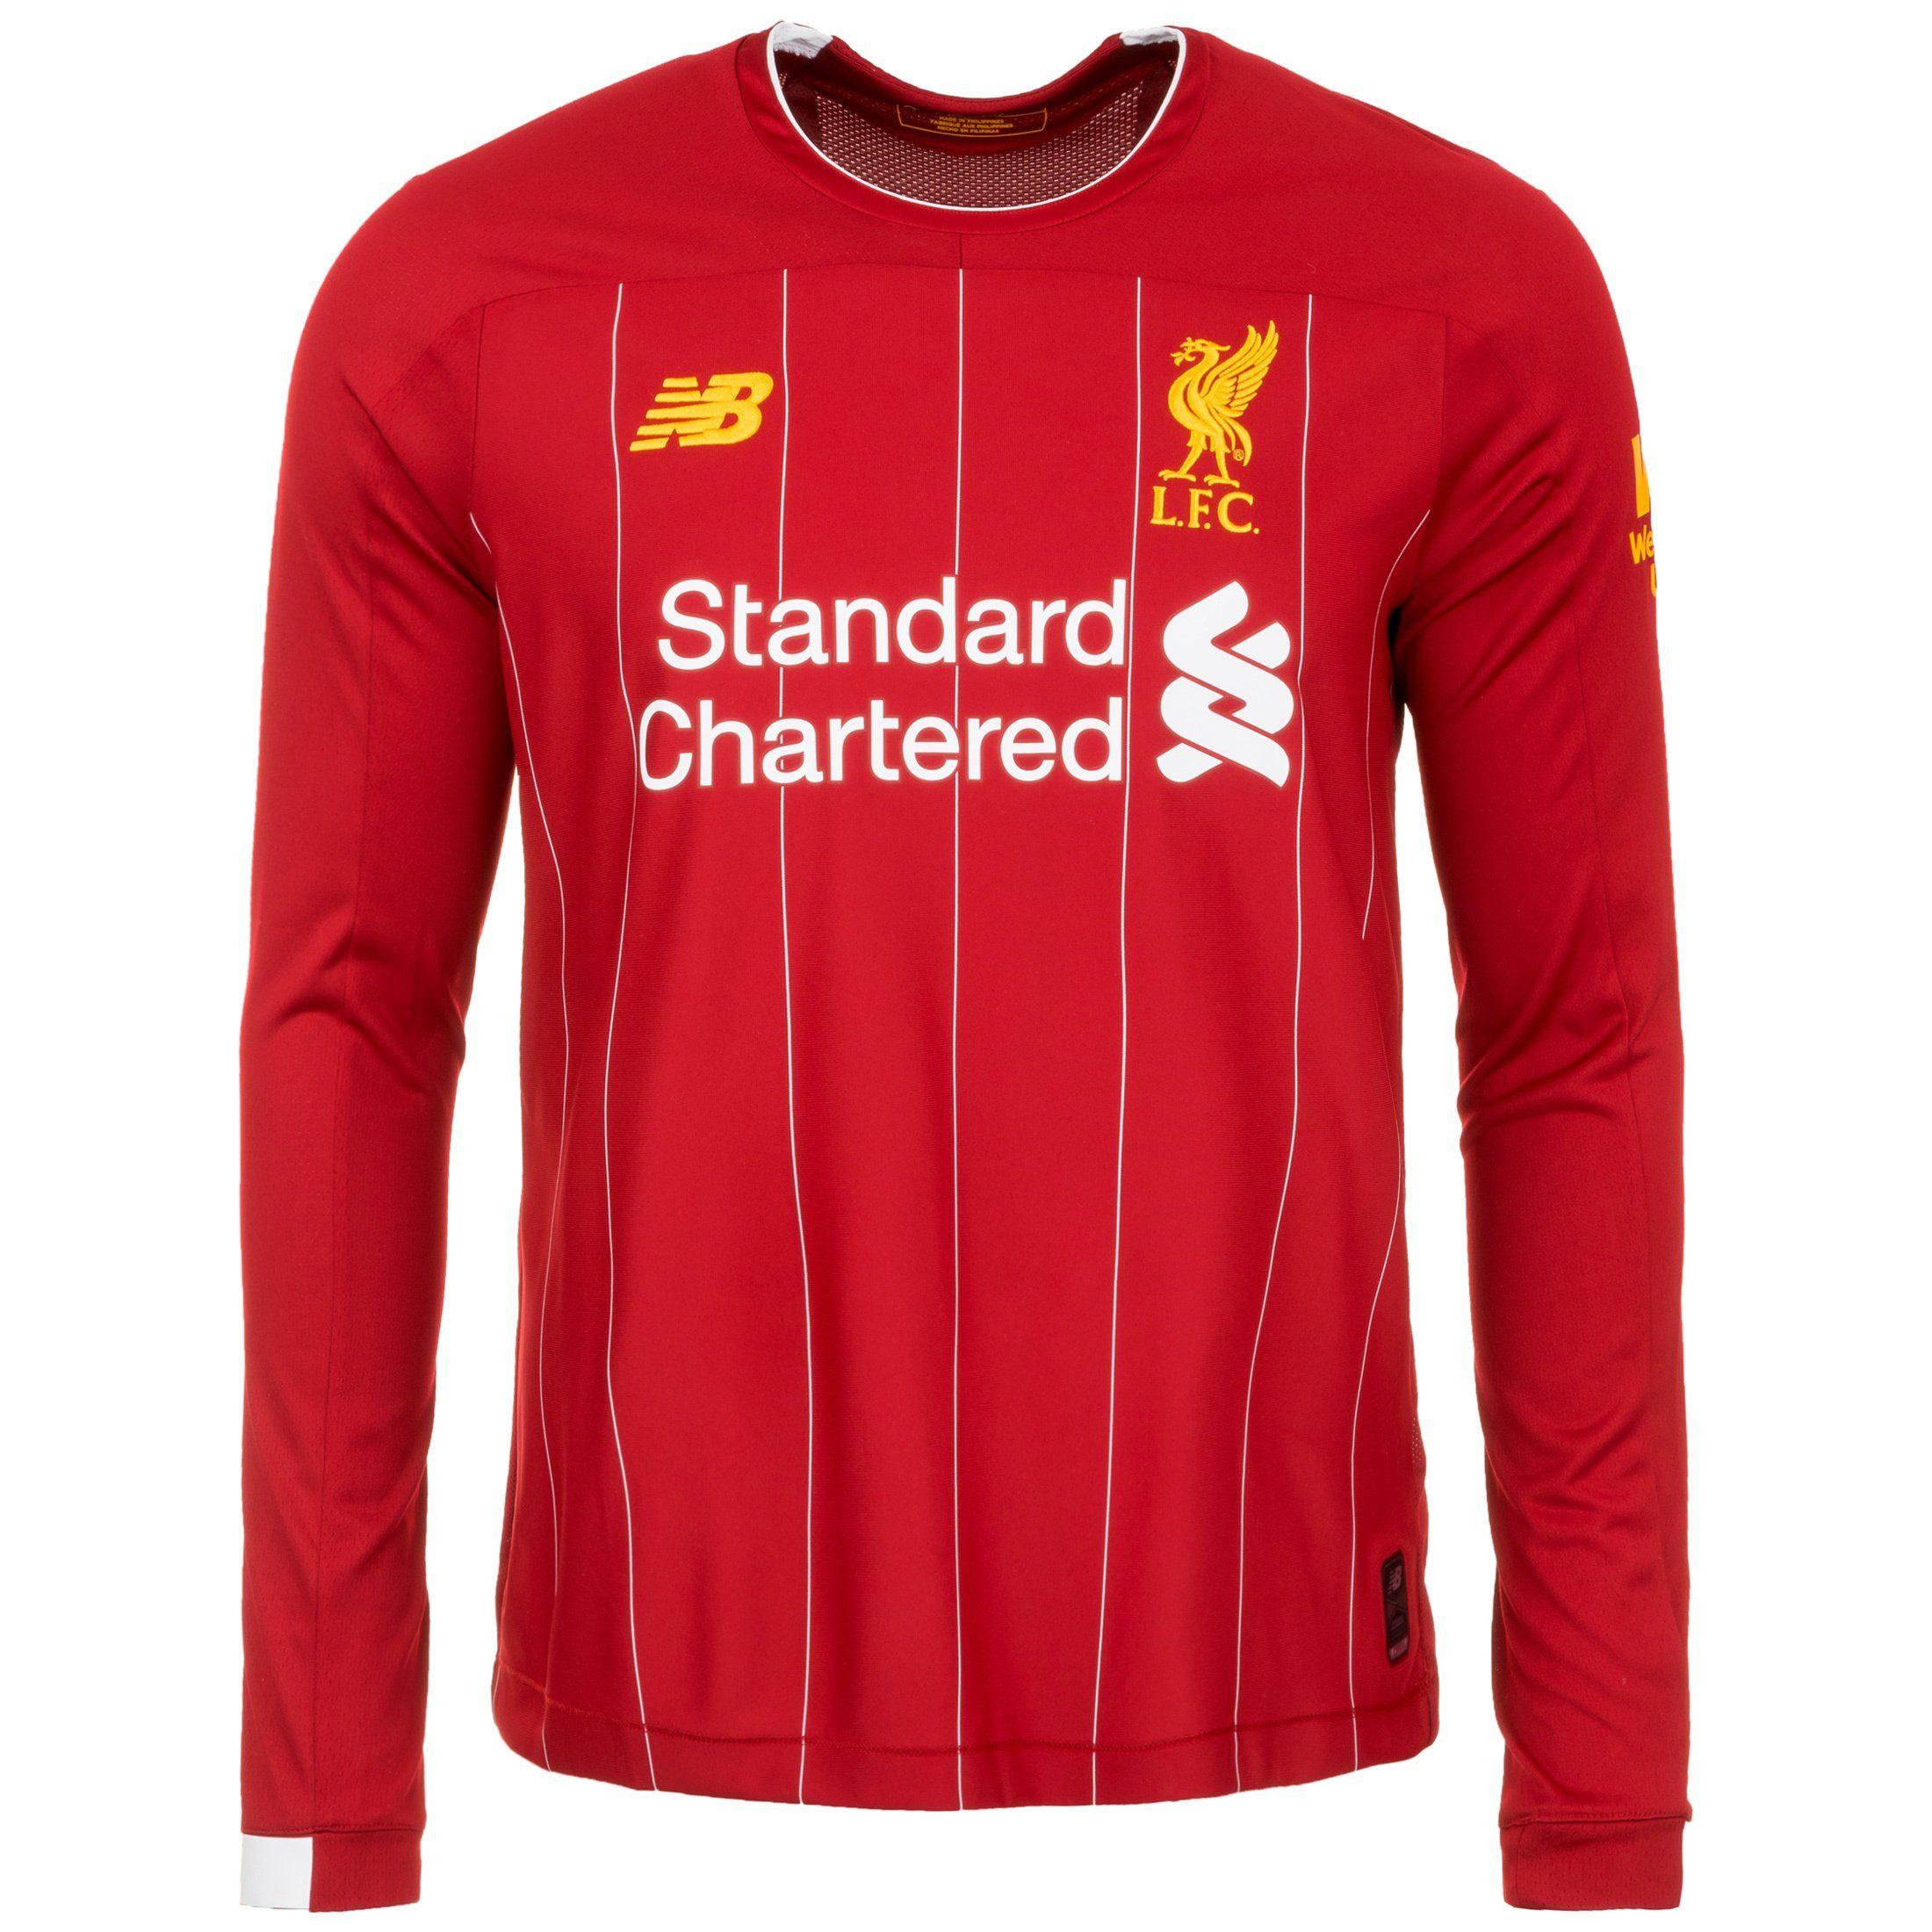 New Balance Fußballtrikot Fc Liverpool Langarm 19/20 Heim | Sportbekleidung > Trikots > Fußballtrikots | Rot | Ab | New Balance